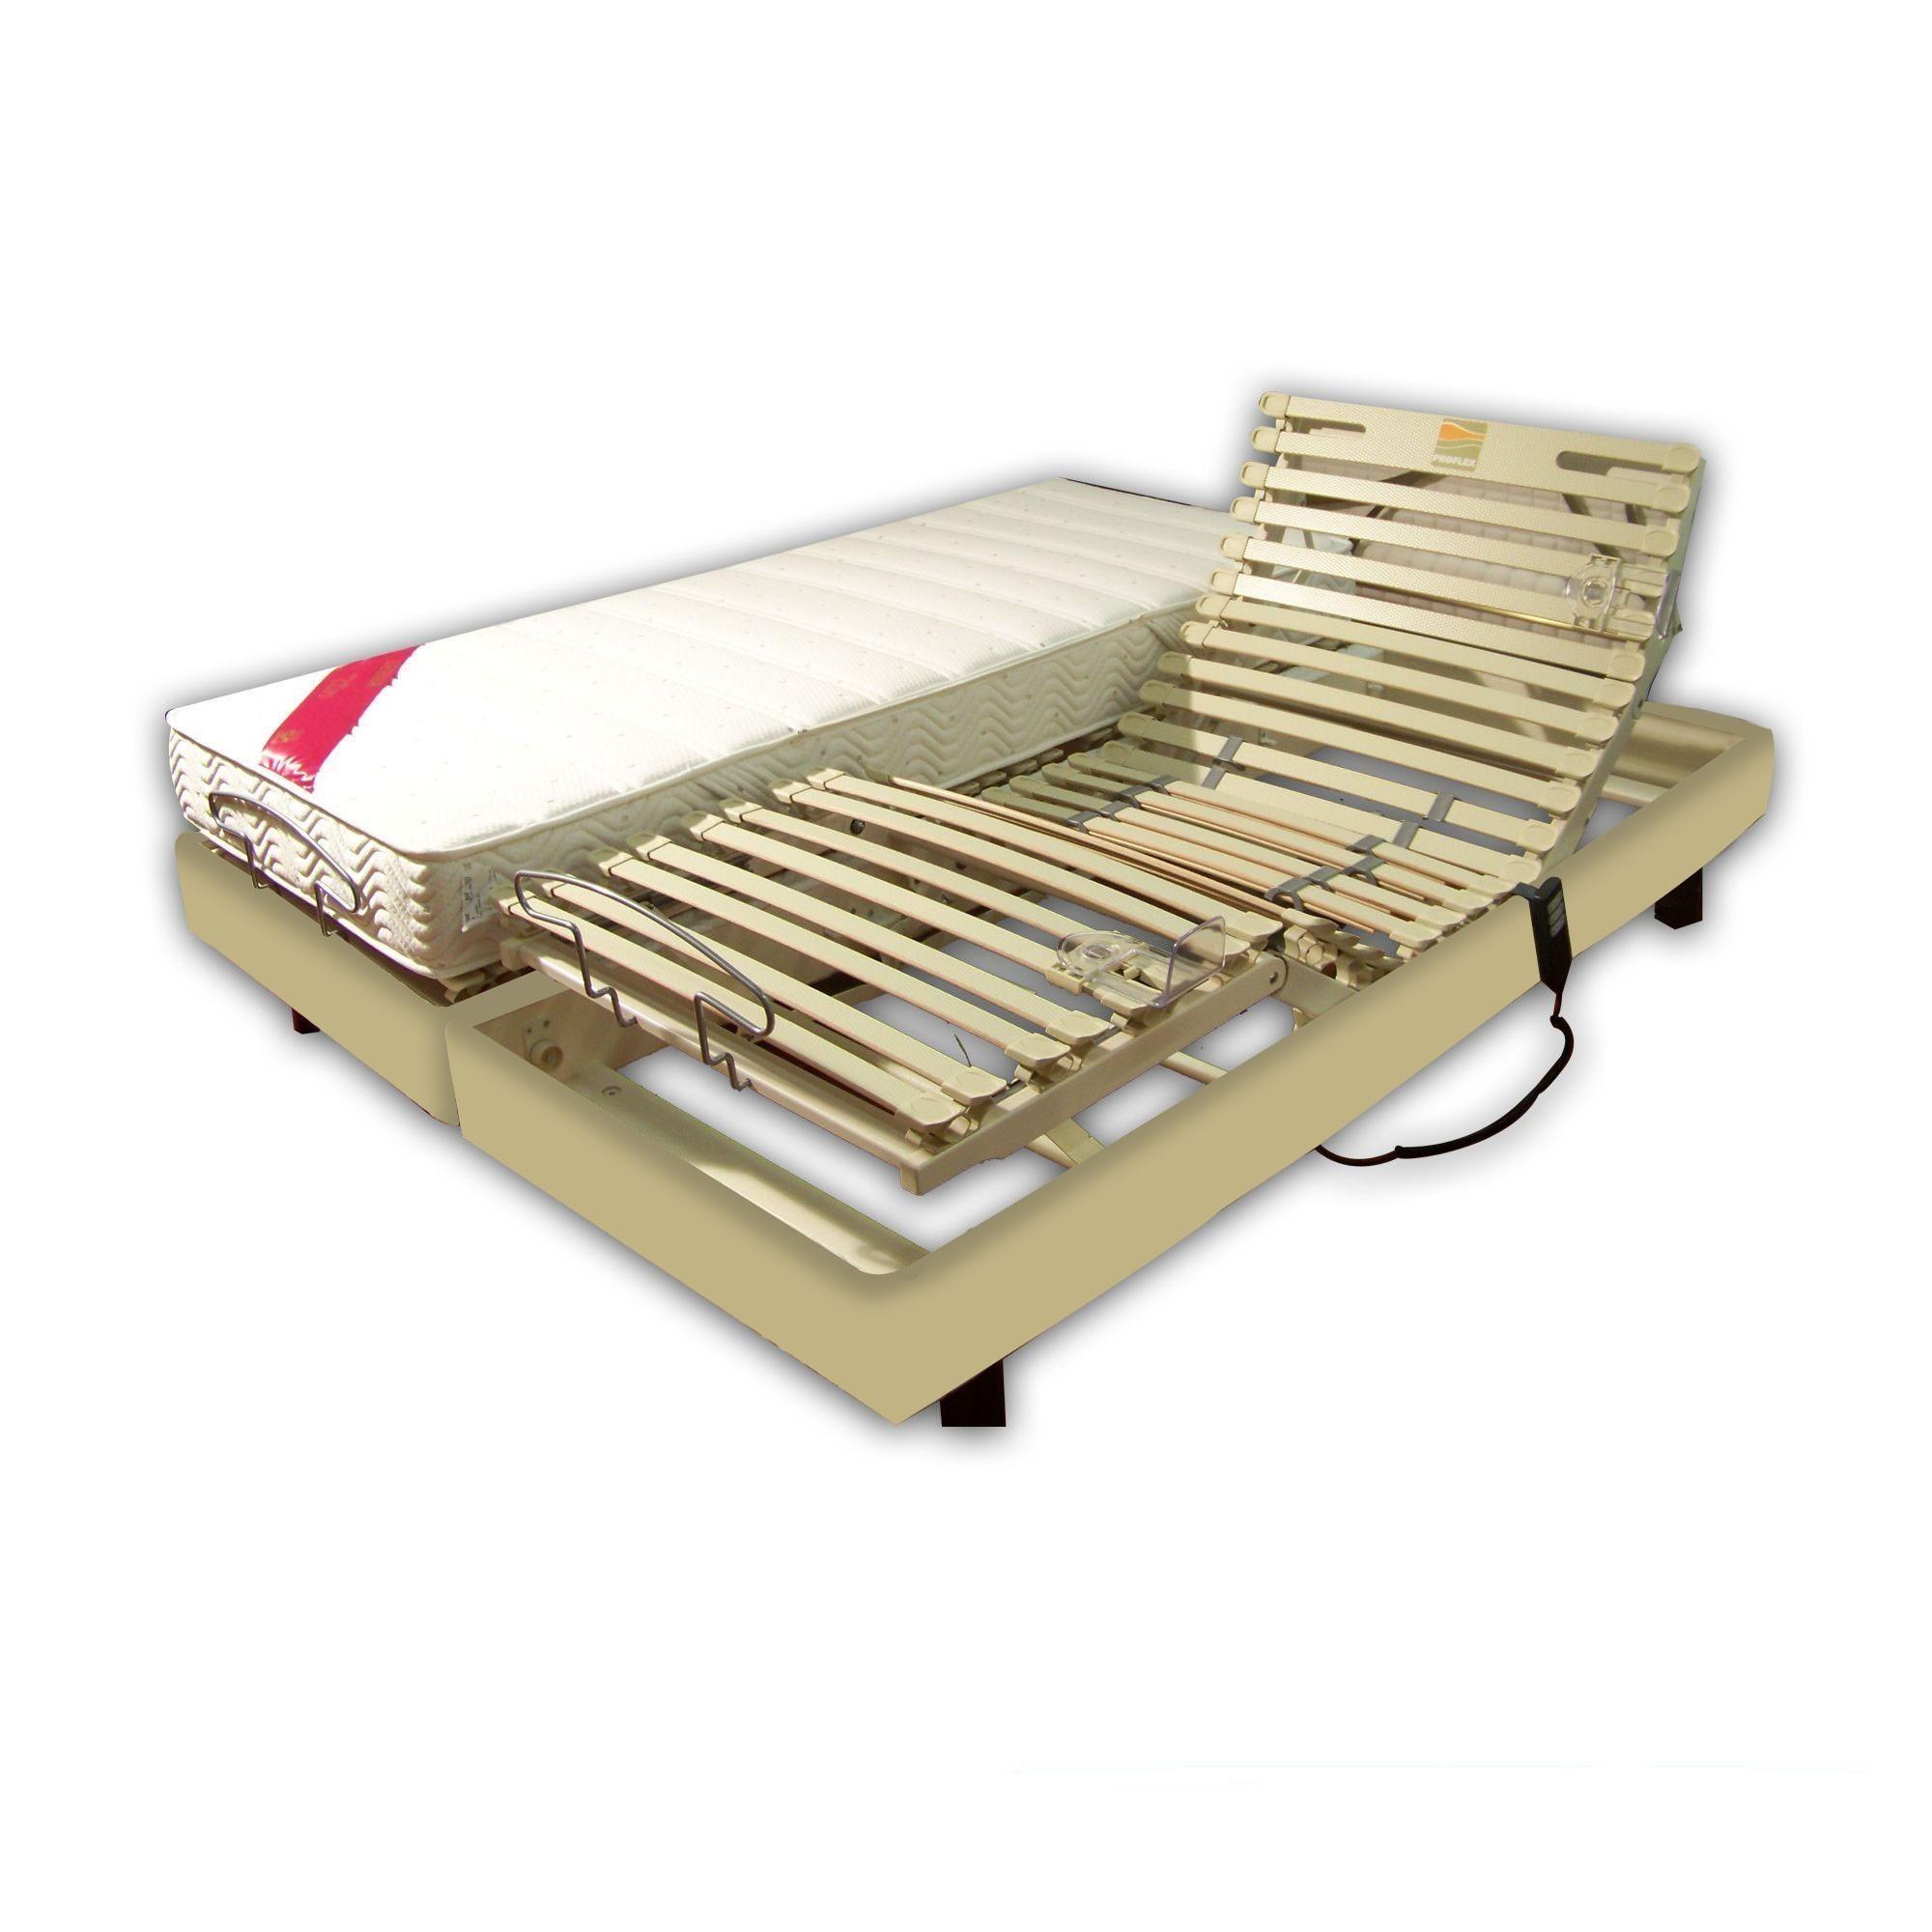 vente ensemble relaxation latex 2x90x200 clips simili cuir ecru pas cher avenue literie. Black Bedroom Furniture Sets. Home Design Ideas